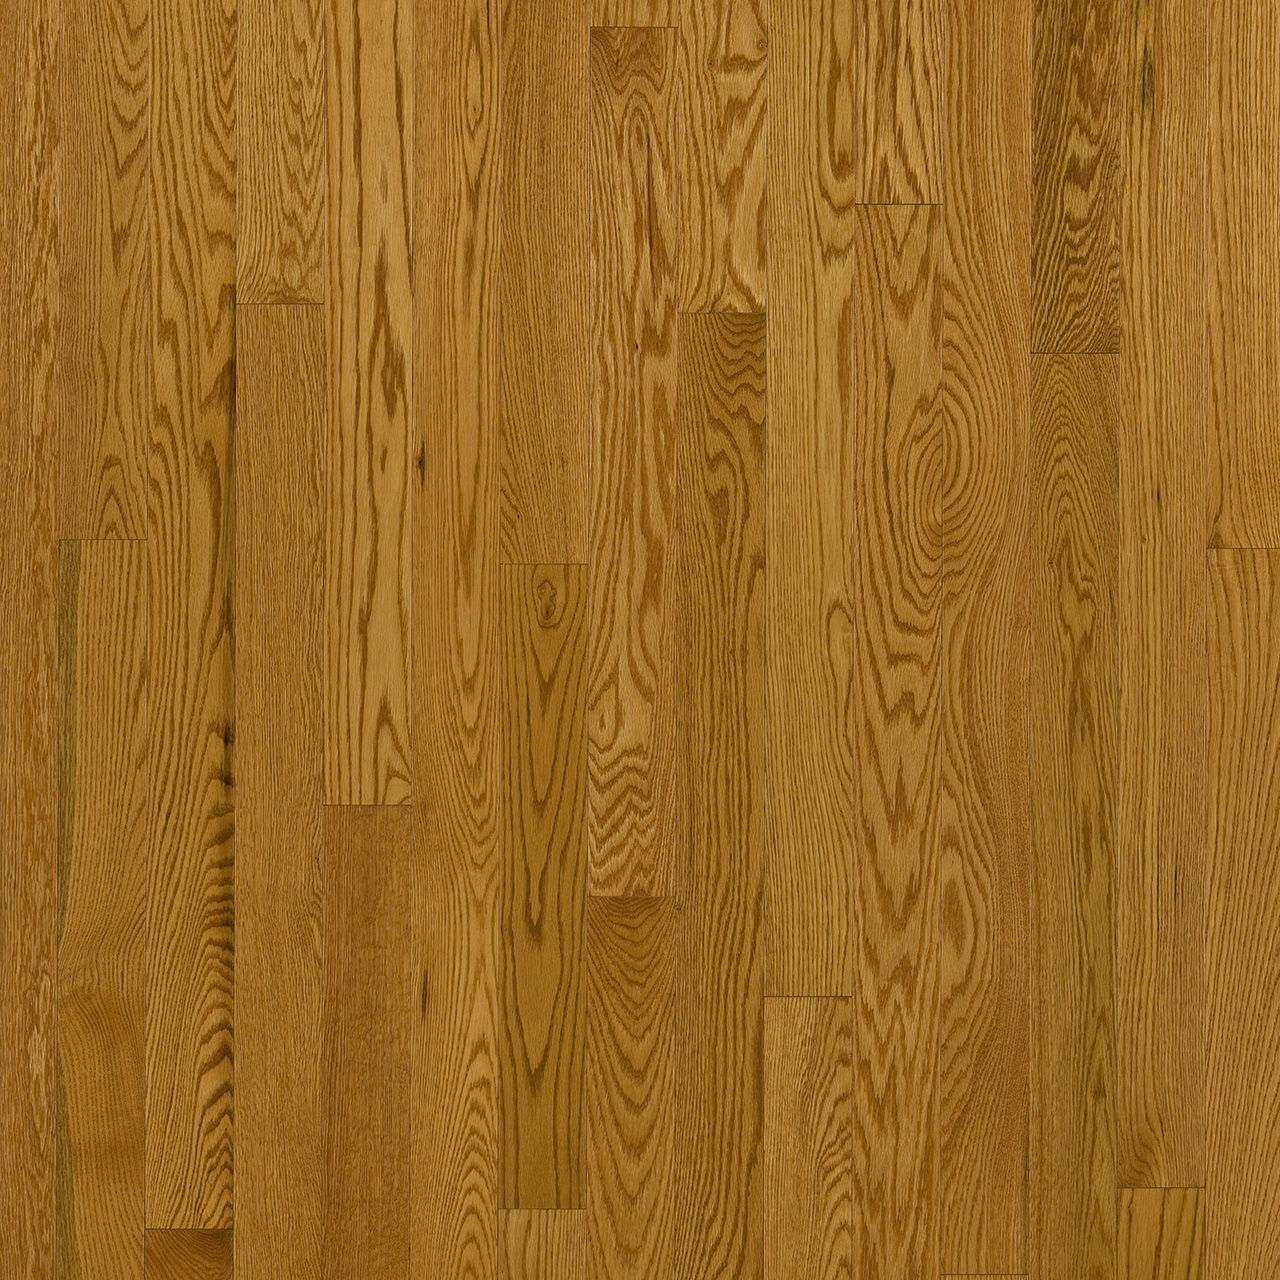 Solid Parquet Floor Engineered Glued Oak Honey